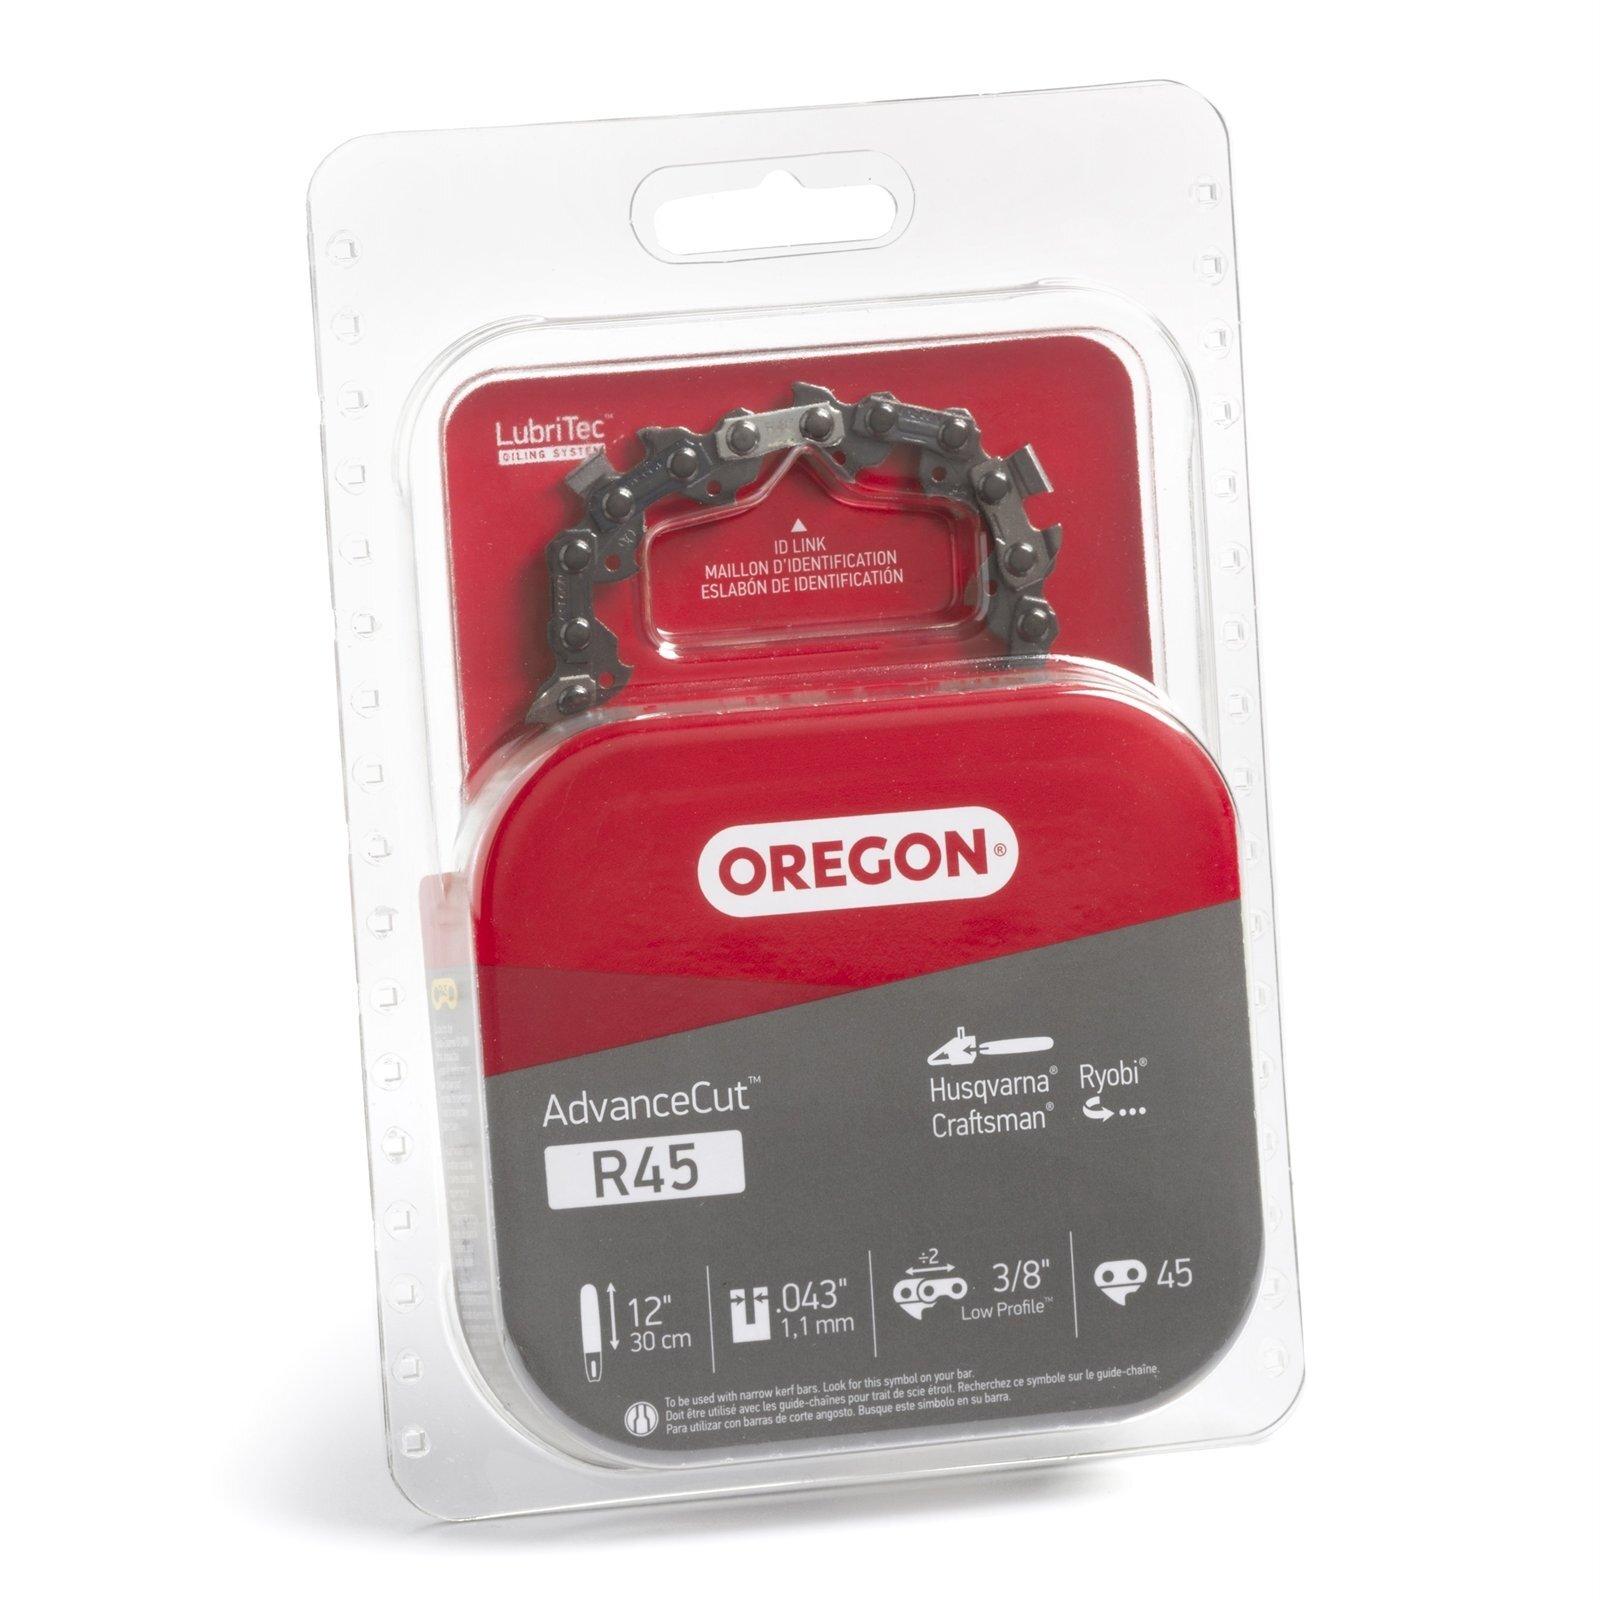 "Oregon 12"" x 3/8"" x 043"" Low Profile R45 Chainsaw Chain"